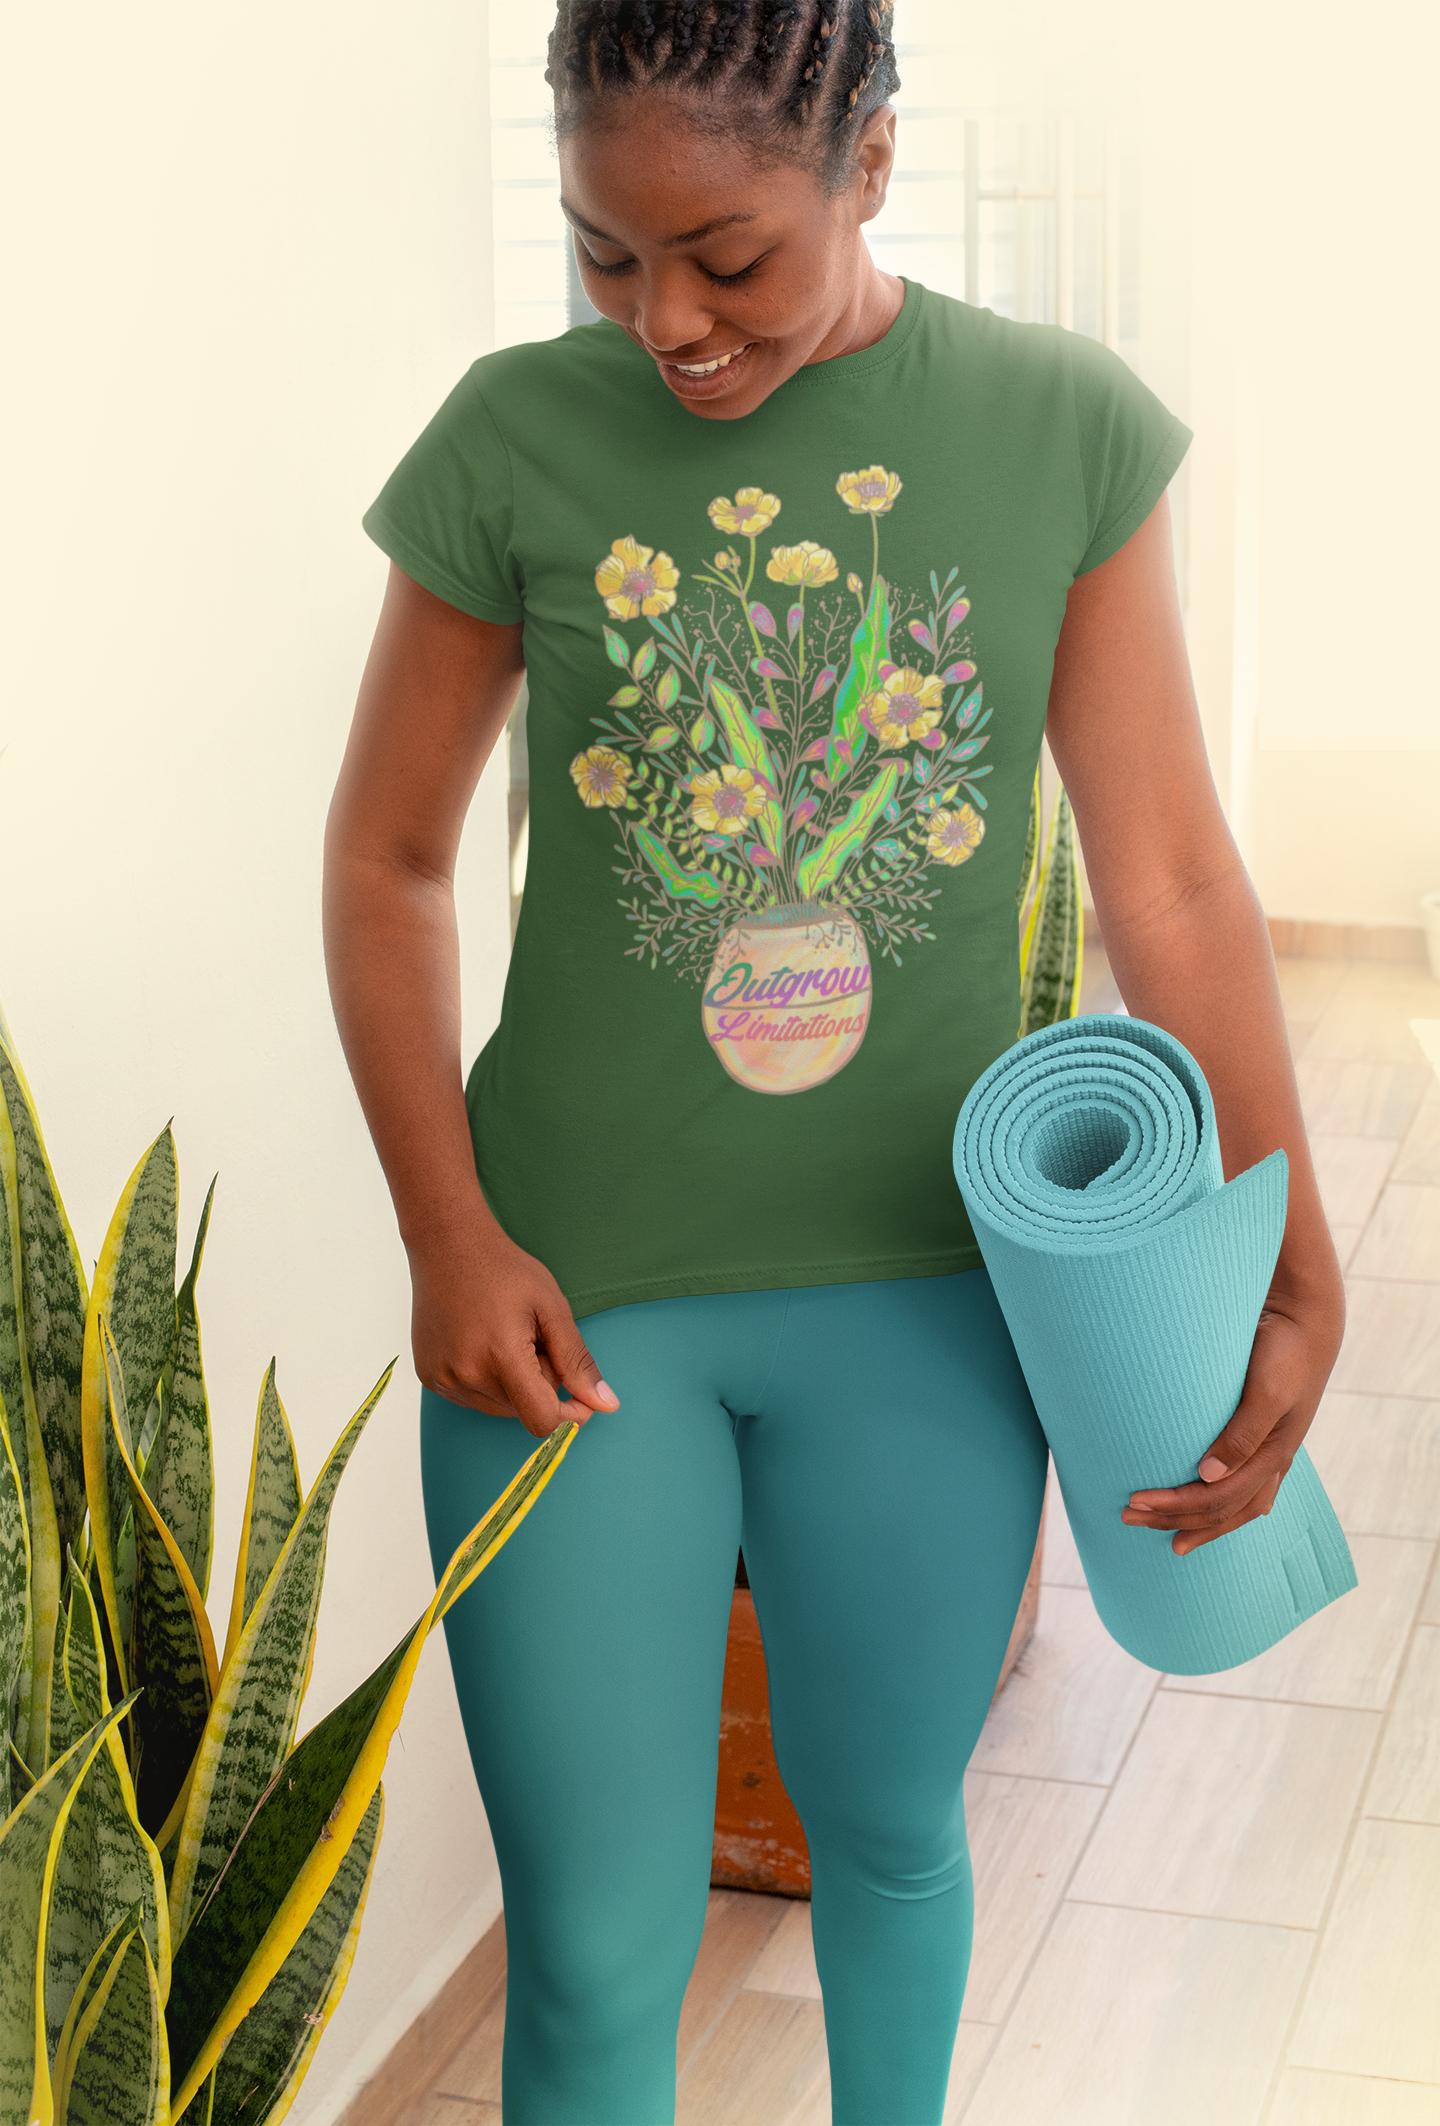 Outgrow Limitations T-shirt